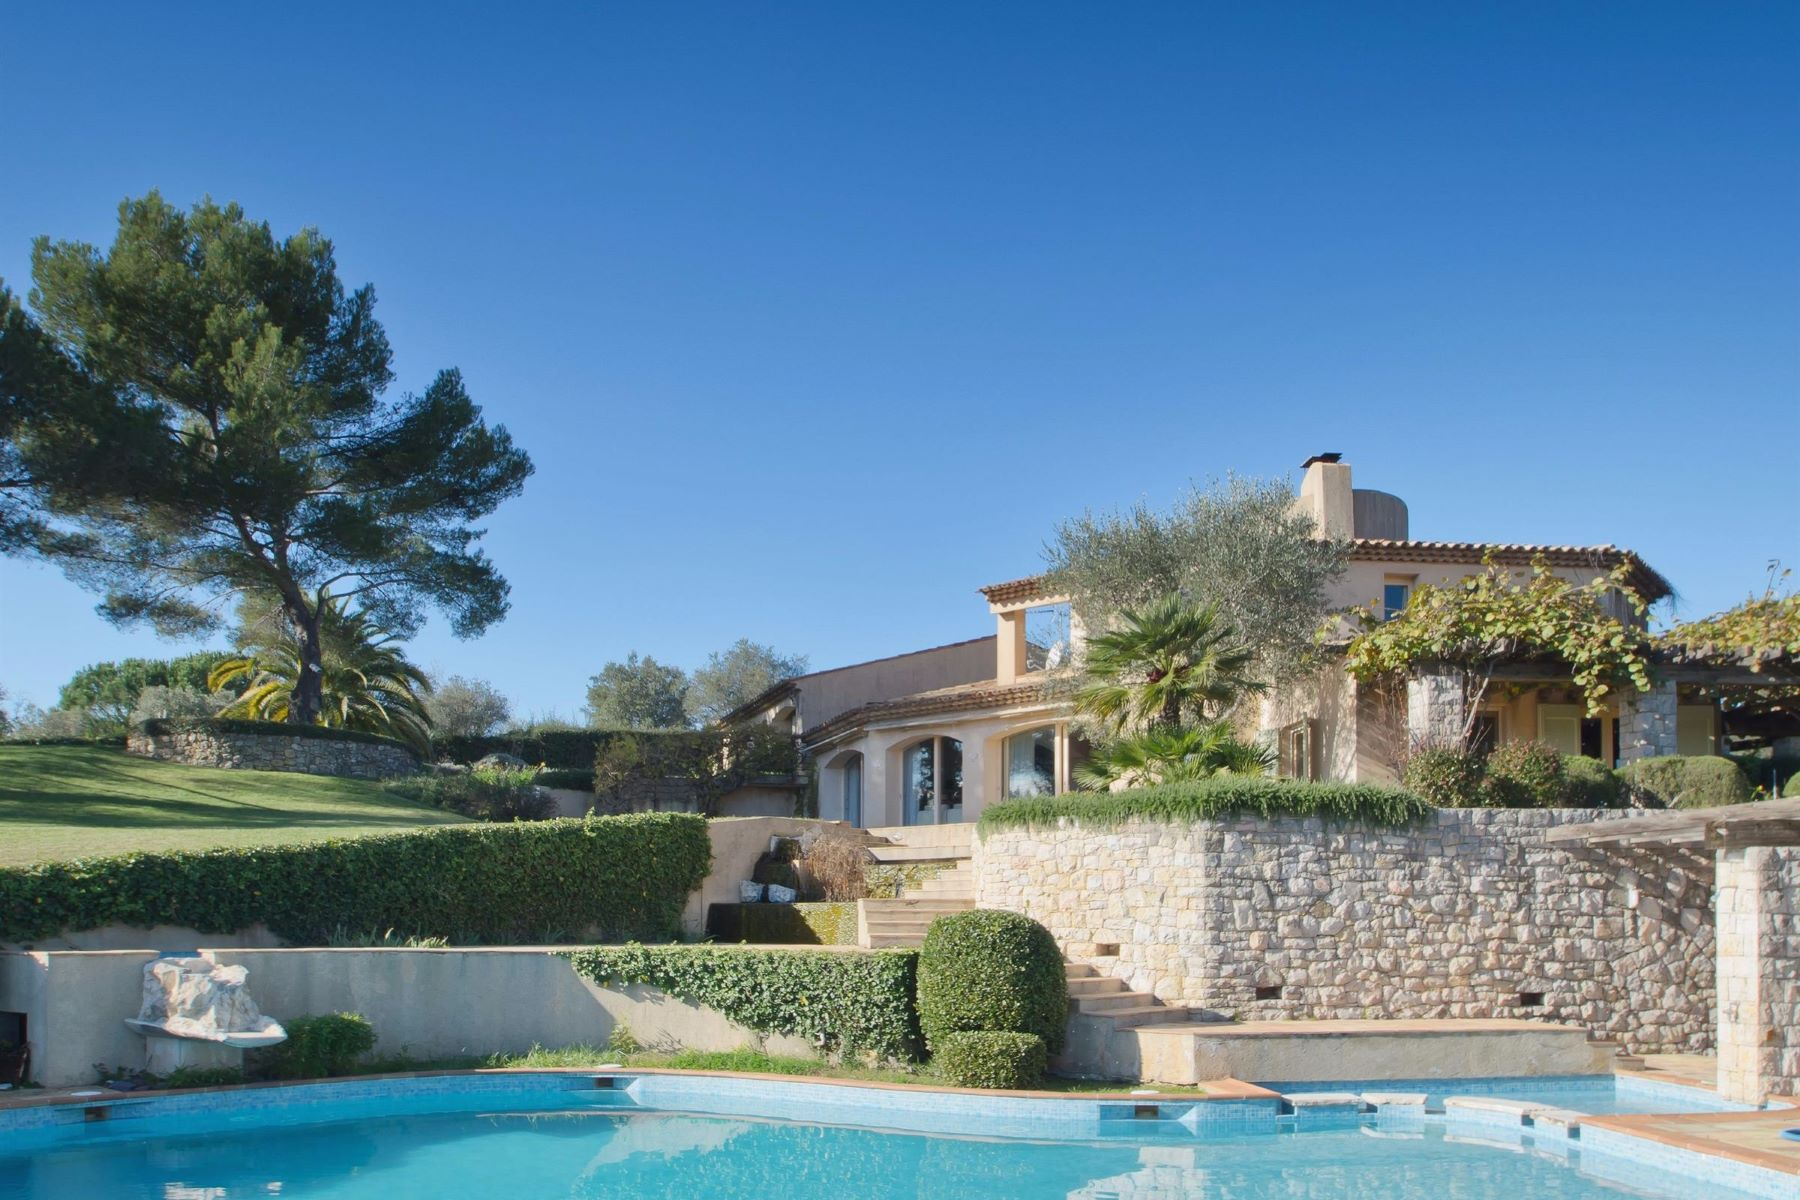 Moradia para Venda às Lovely Provencal villa for sale in a secured domain of Mougins Mougins, Provença-Alpes-Costa Azul, 06250 França